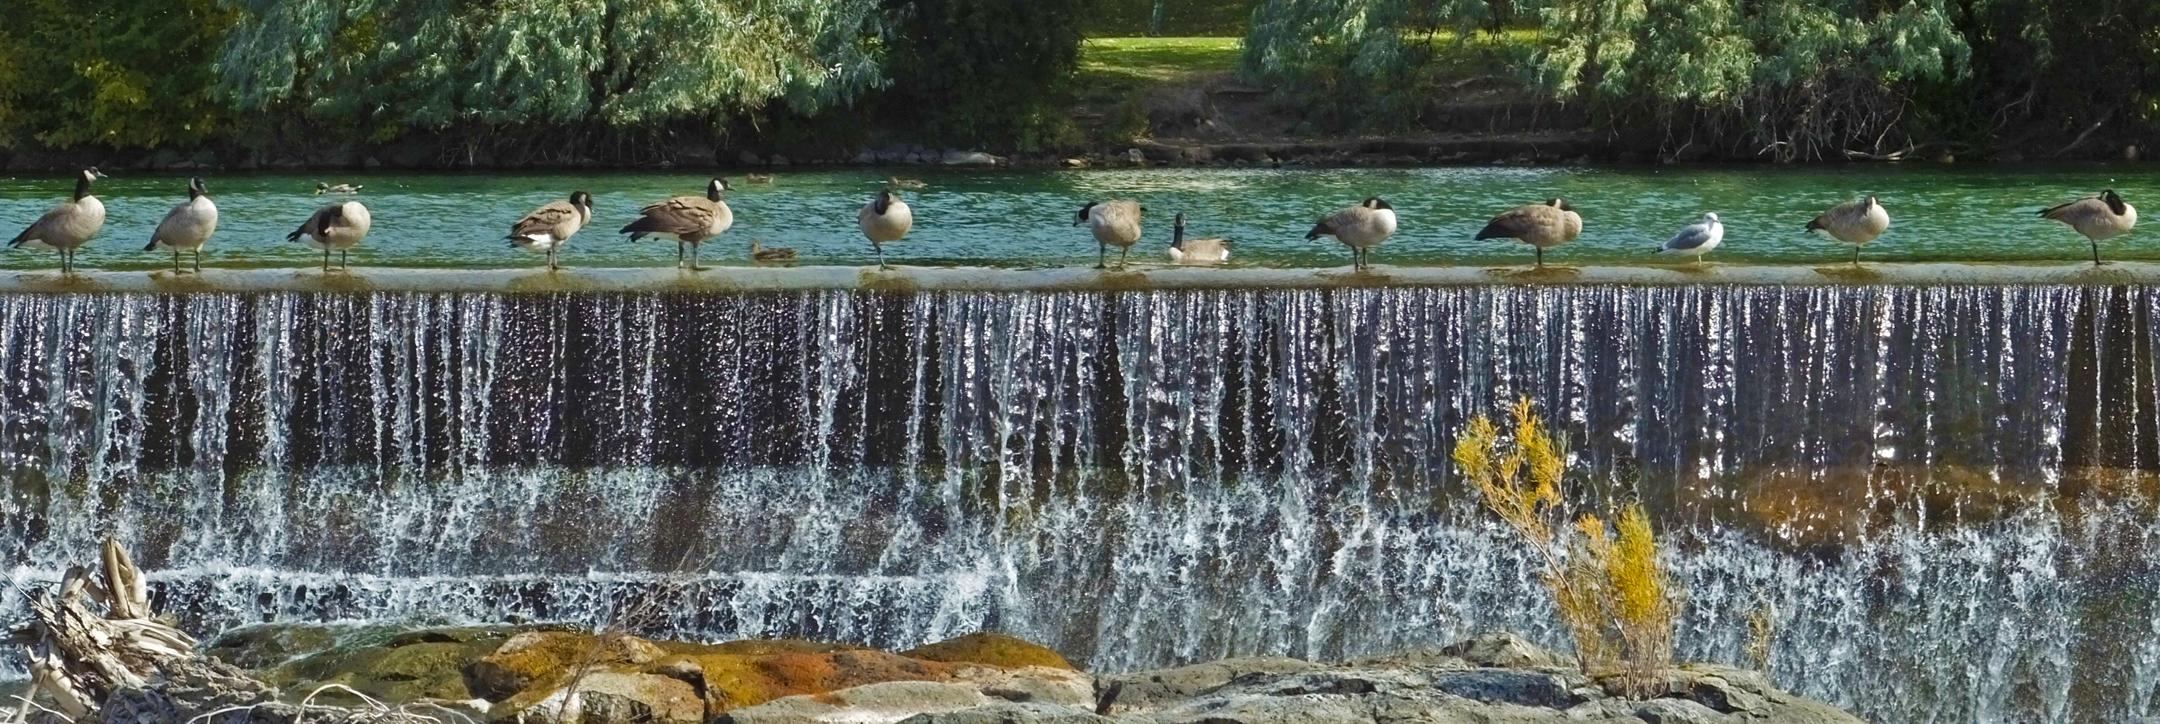 File:Geese on falls wall Idaho Falls.jpg